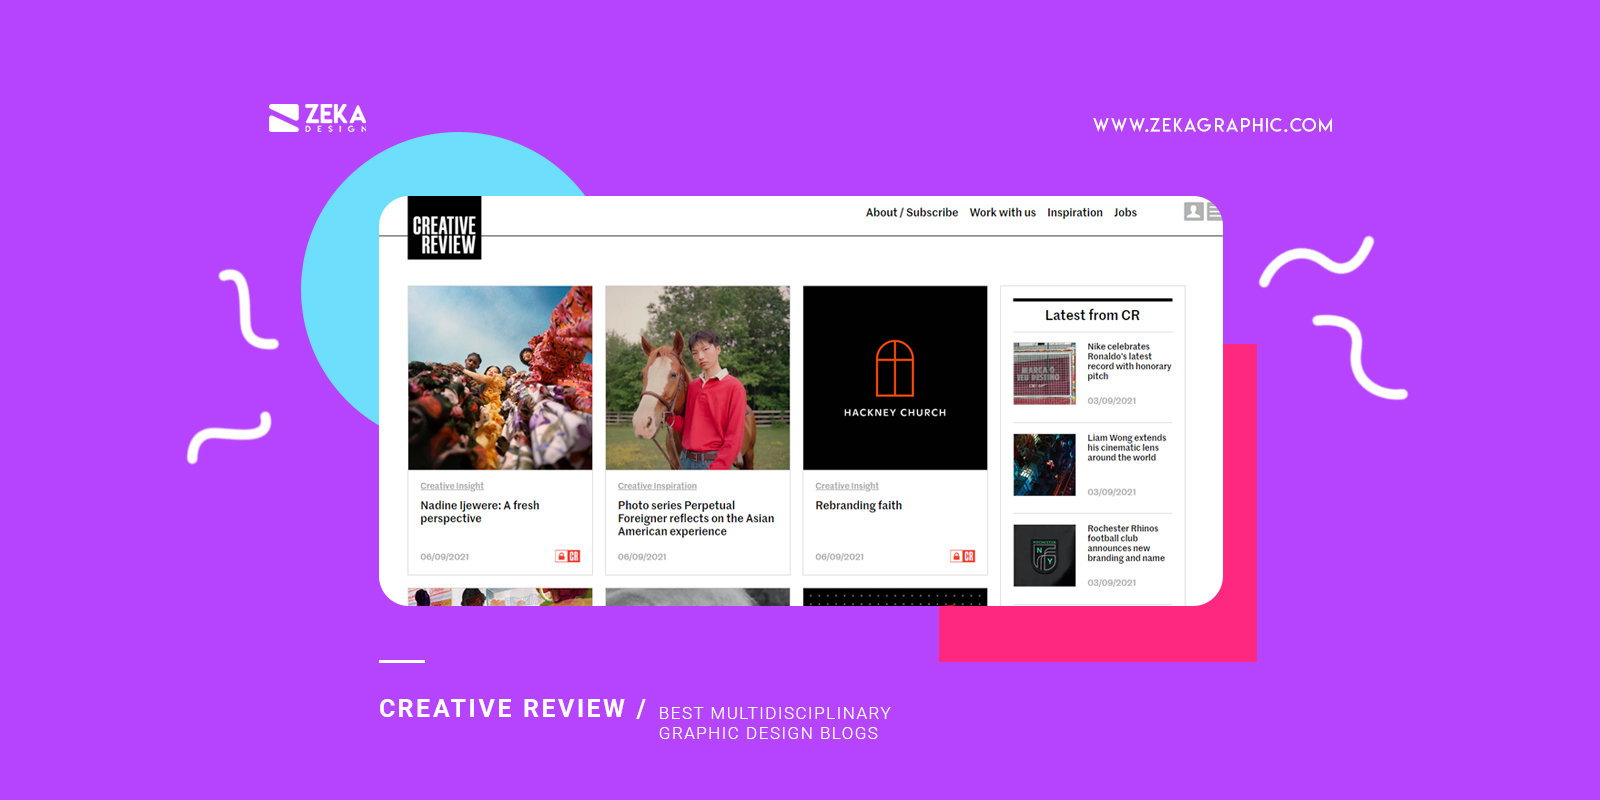 Creative Review Best Multidisciplinary Graphic Design Blogs